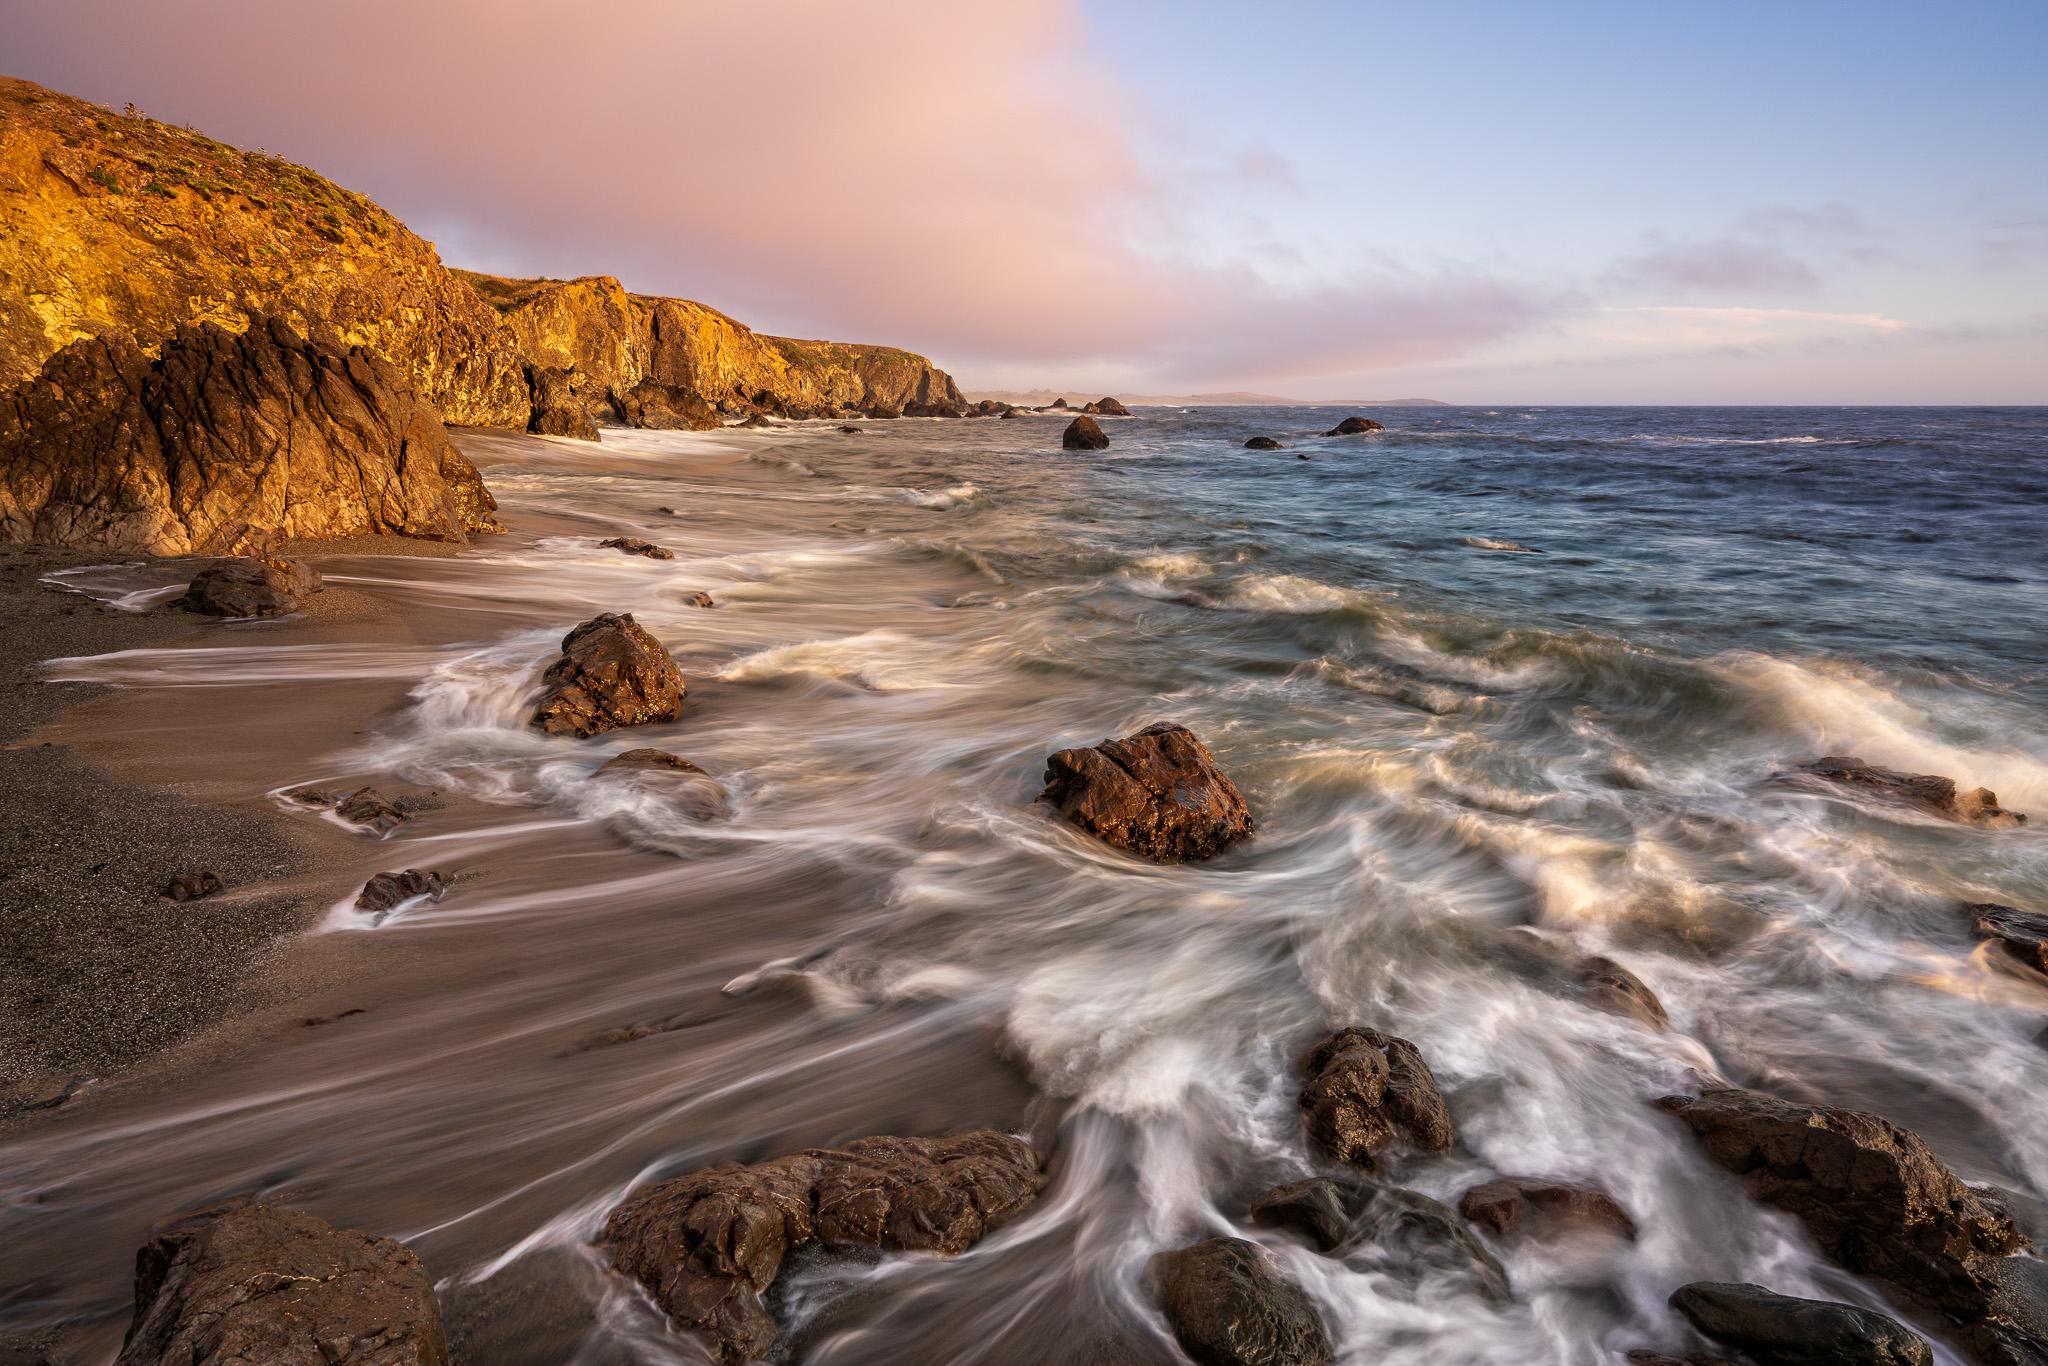 Marshall Gulch, Bodega Bay, California